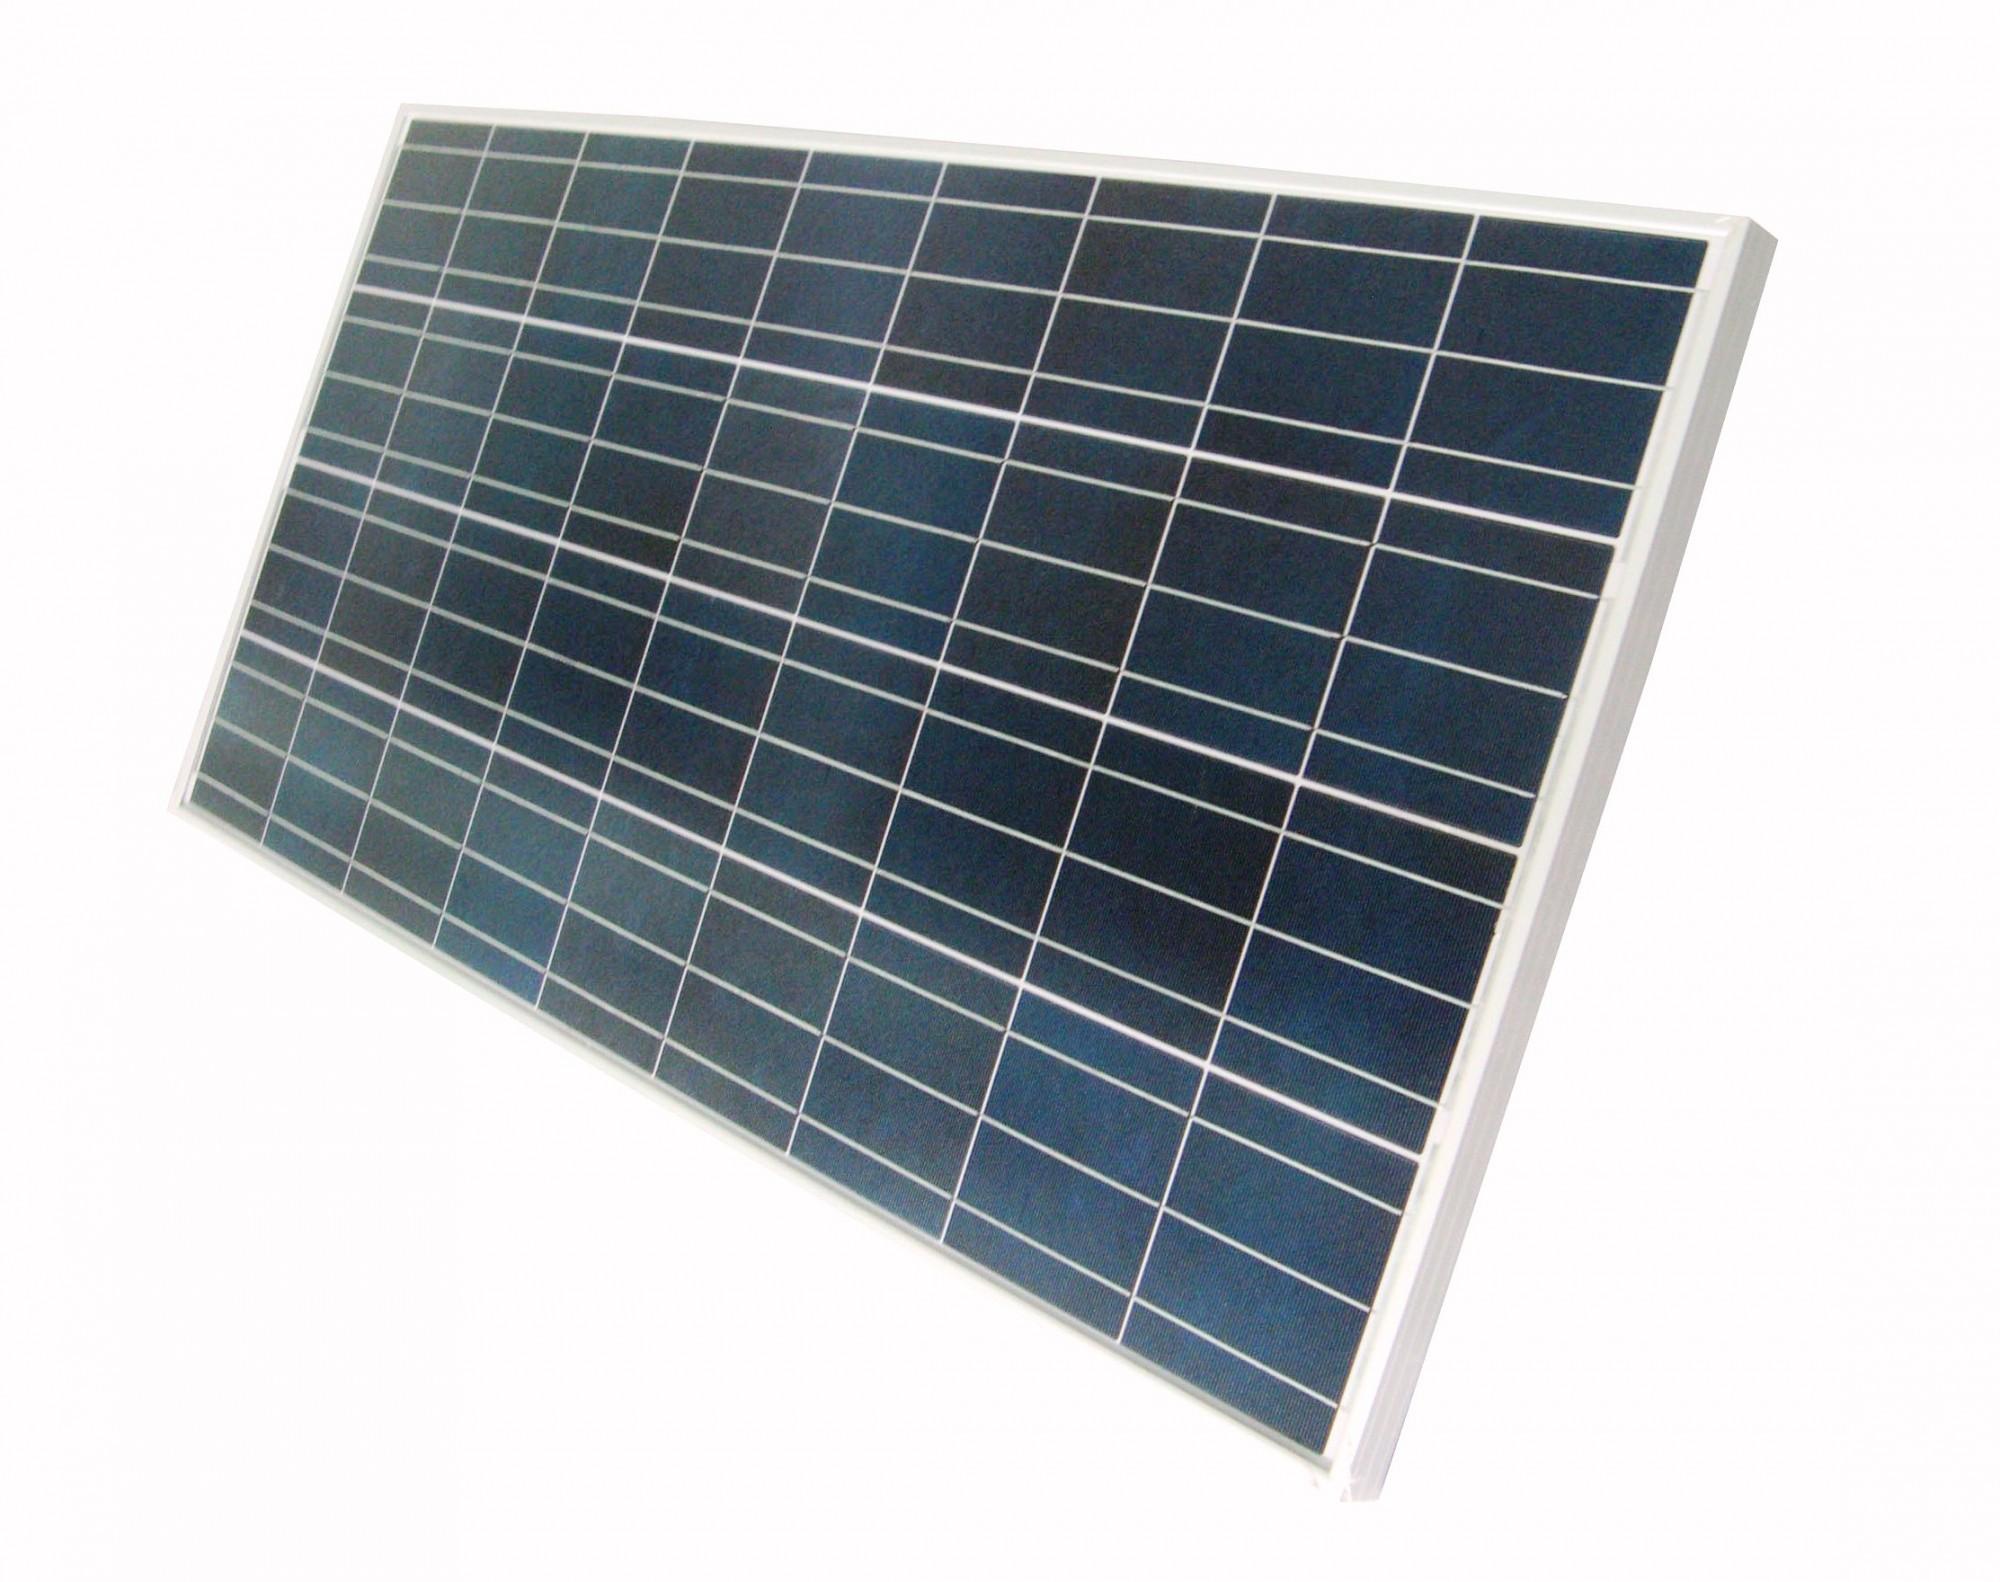 Solarpanel Solarmodul Solarzelle 12v 24volt 5w 40w 50w